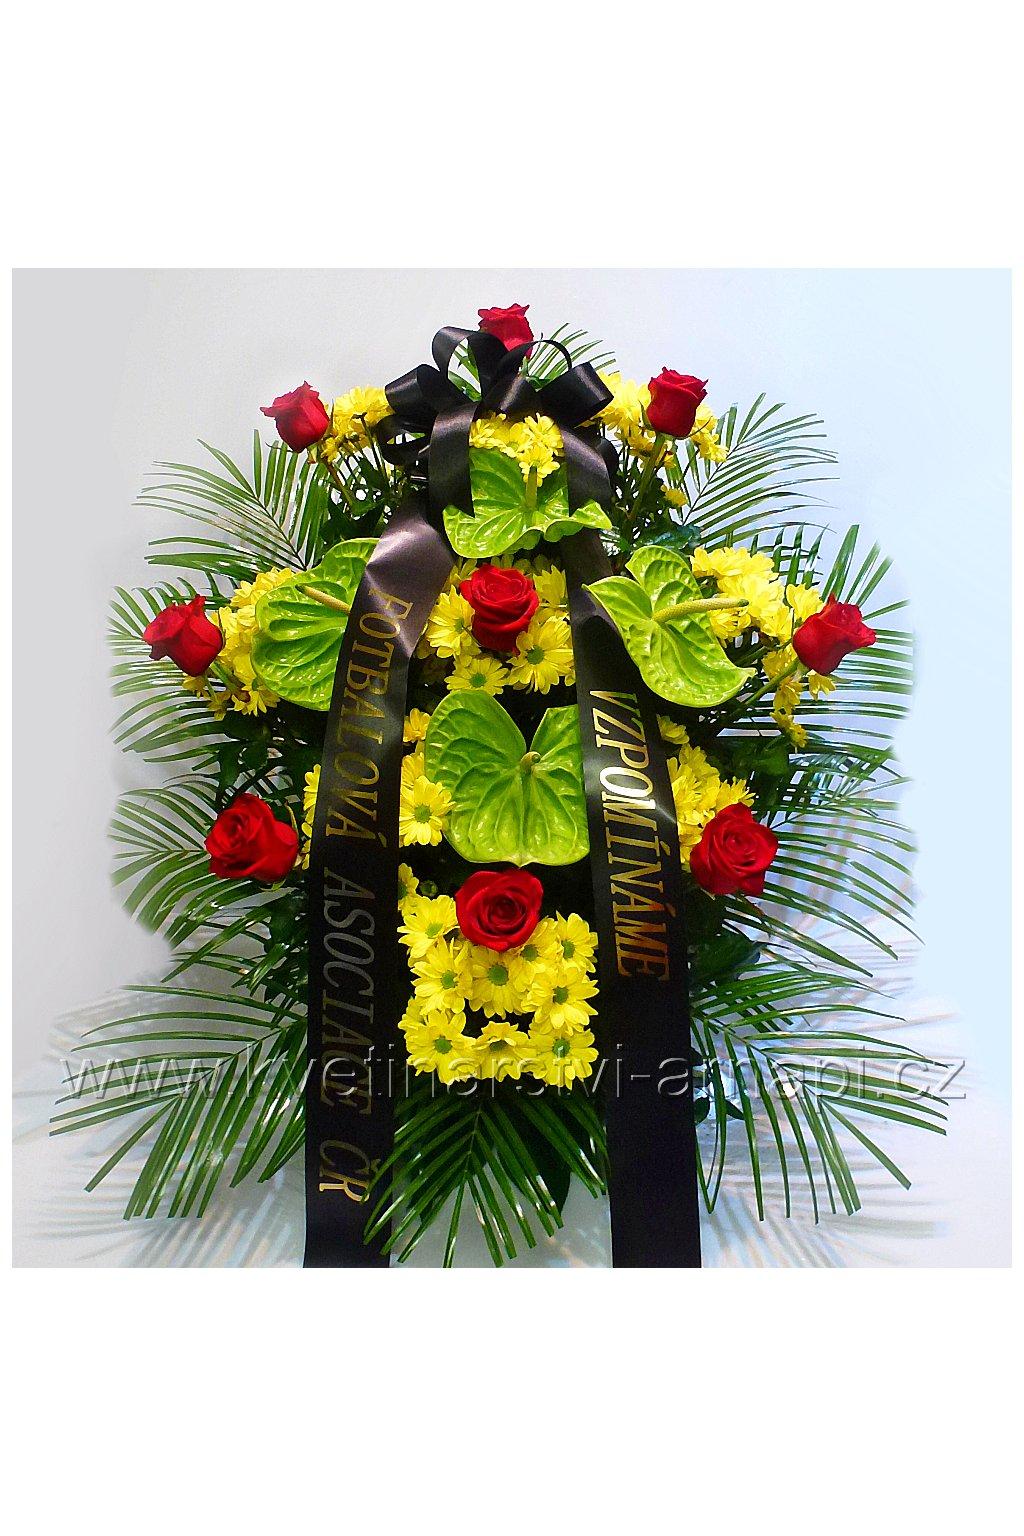 smutecni kytice ruze kvetinarstvi arnapi